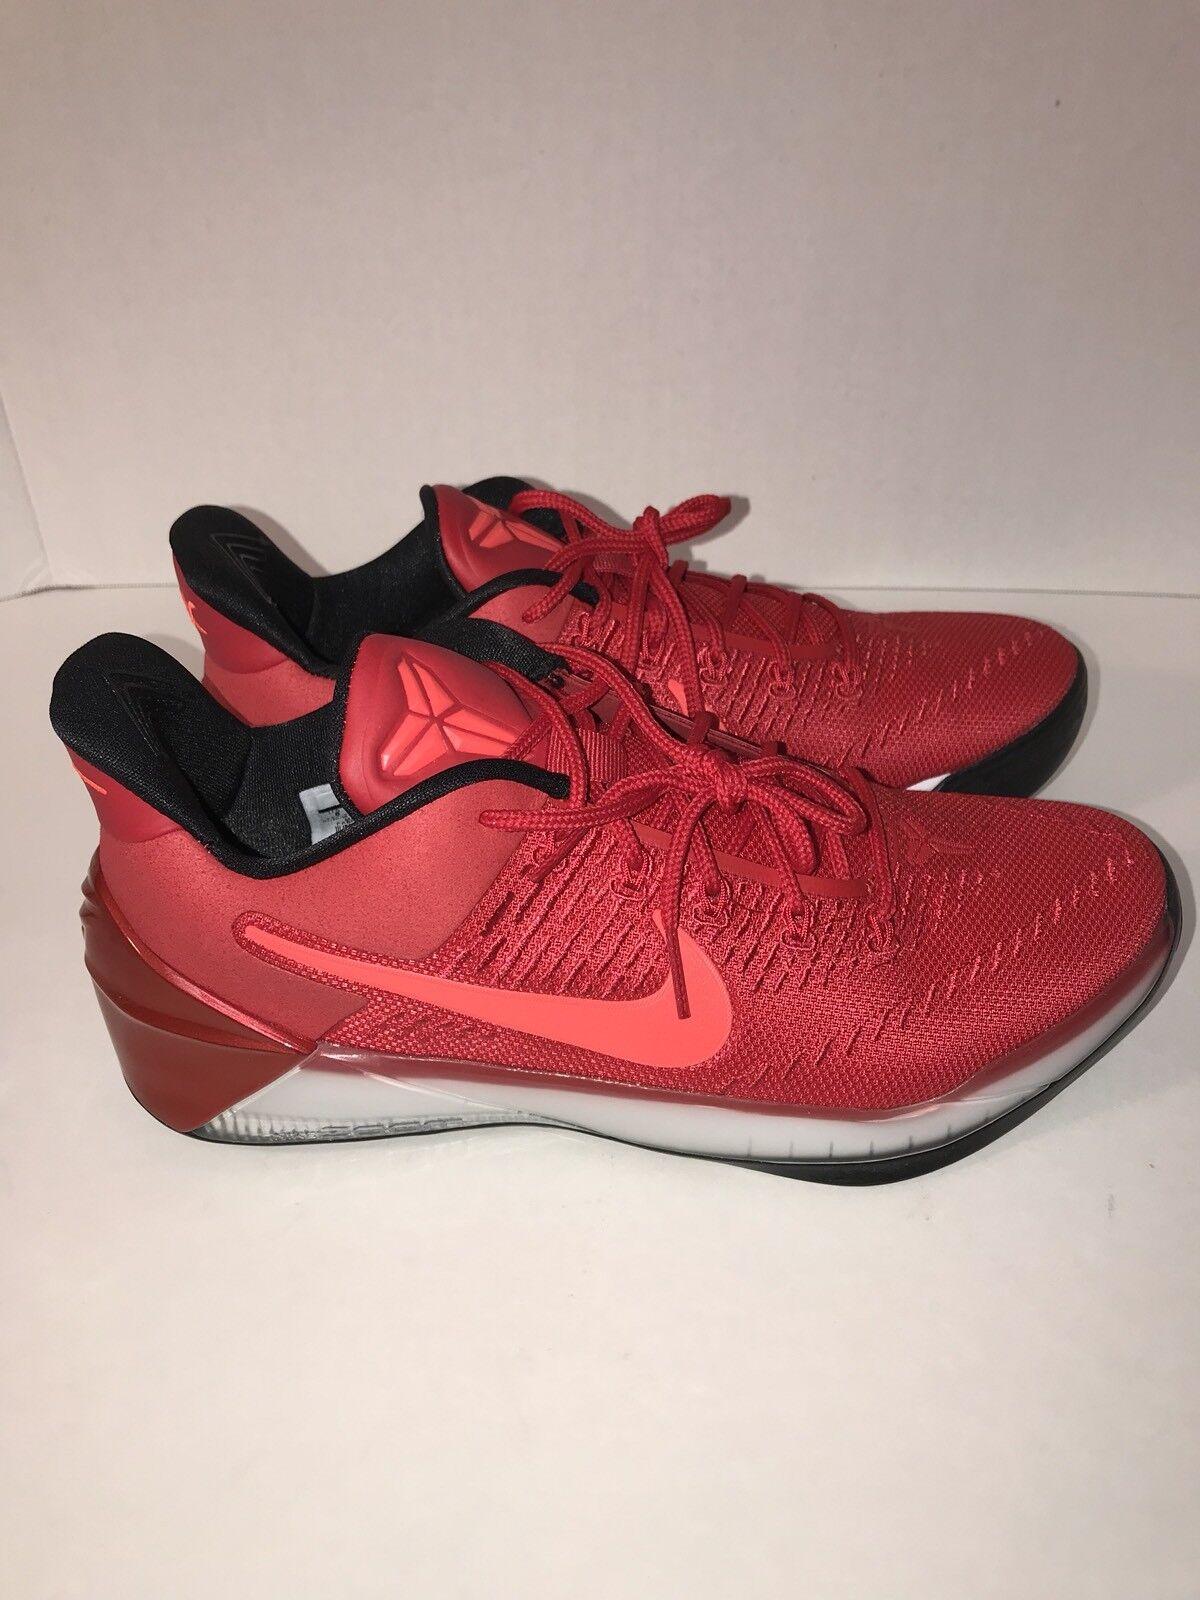 2017 Nike Zoom Kobe A.D. SZ 13 University University University Red X-Mas FTB Bryant 852425-608 f213fc